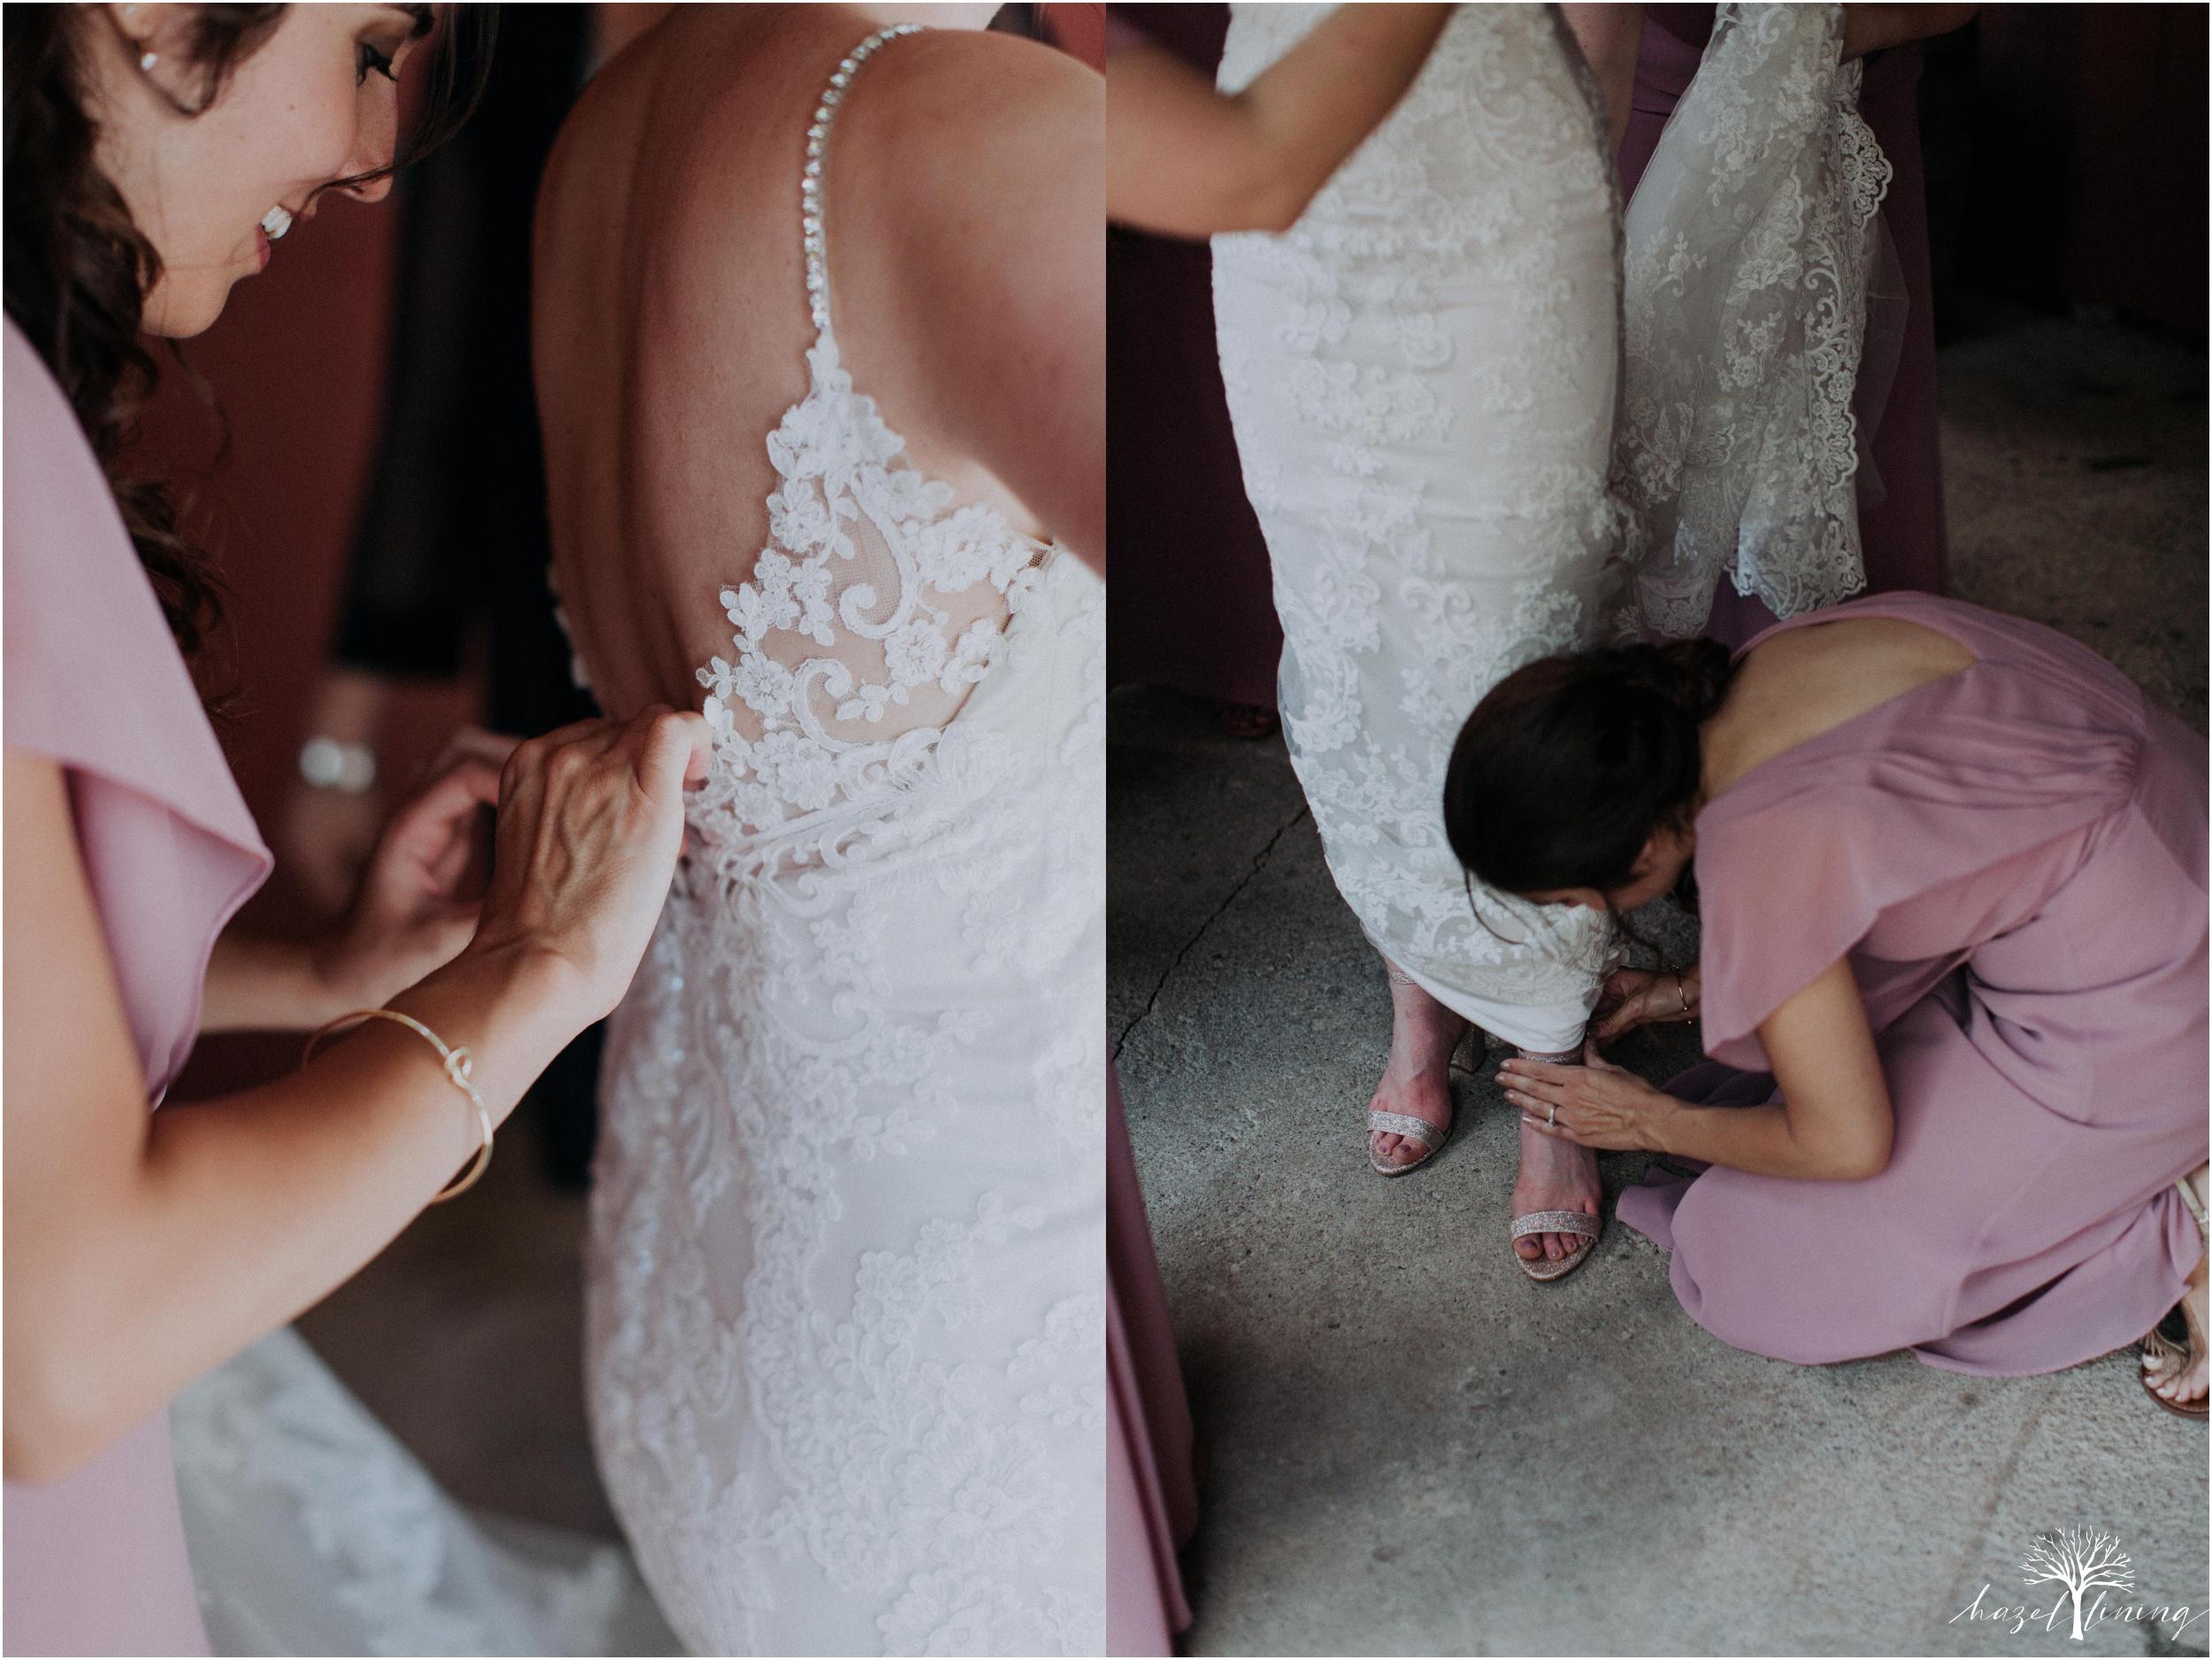 hazel-lining-travel-wedding-elopement-photography-lisa-landon-shoemaker-the-farm-bakery-and-events-bucks-county-quakertown-pennsylvania-summer-country-outdoor-farm-wedding_0010.jpg